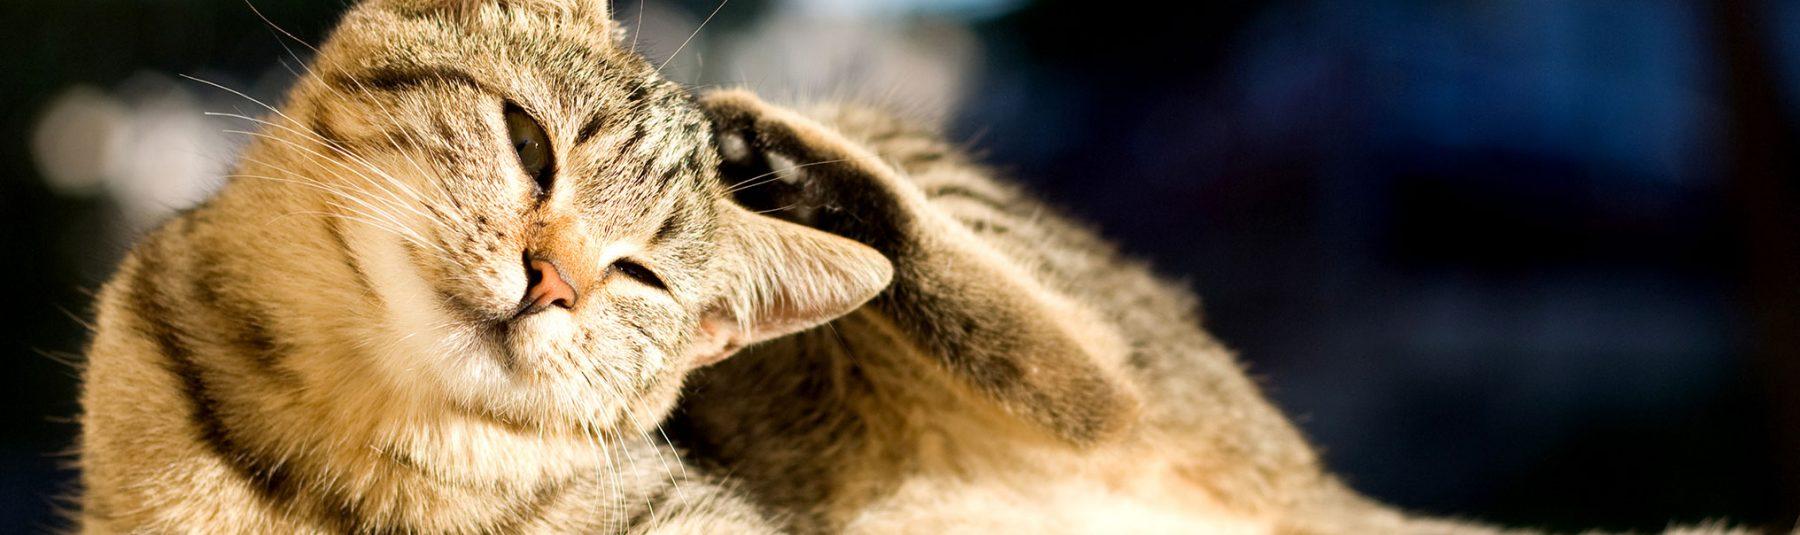 cat-services